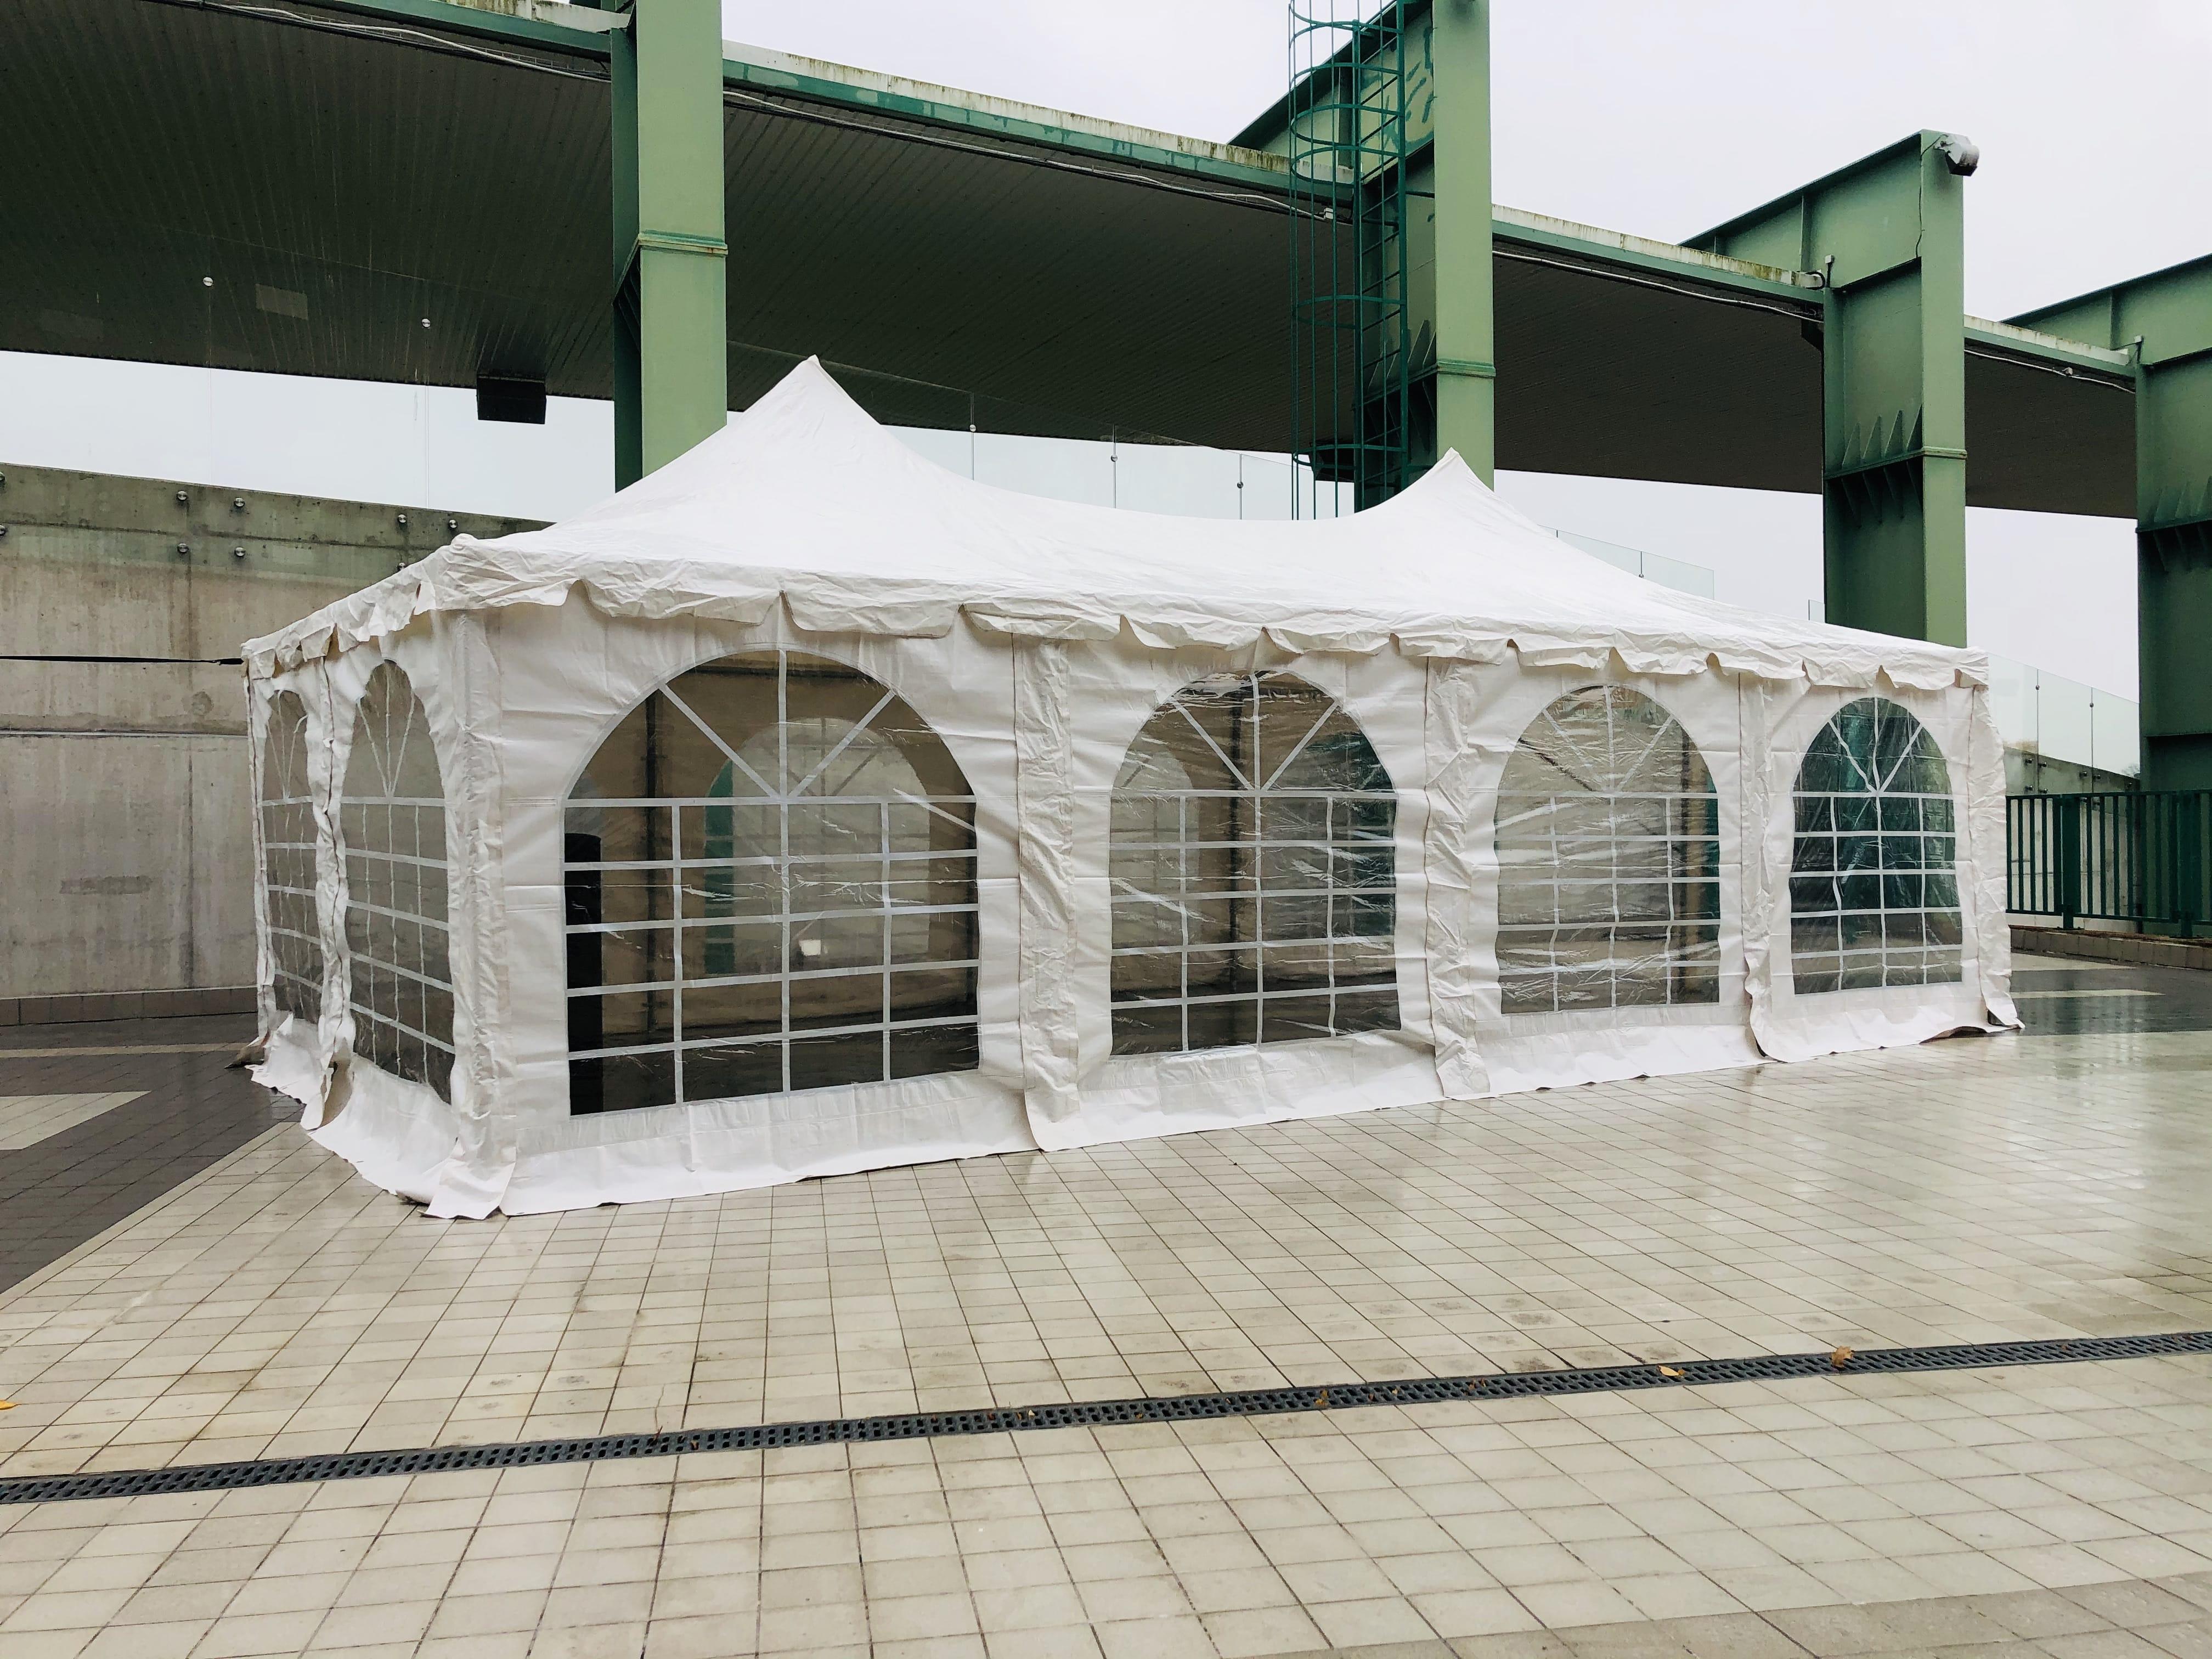 4m x 8m telts noma